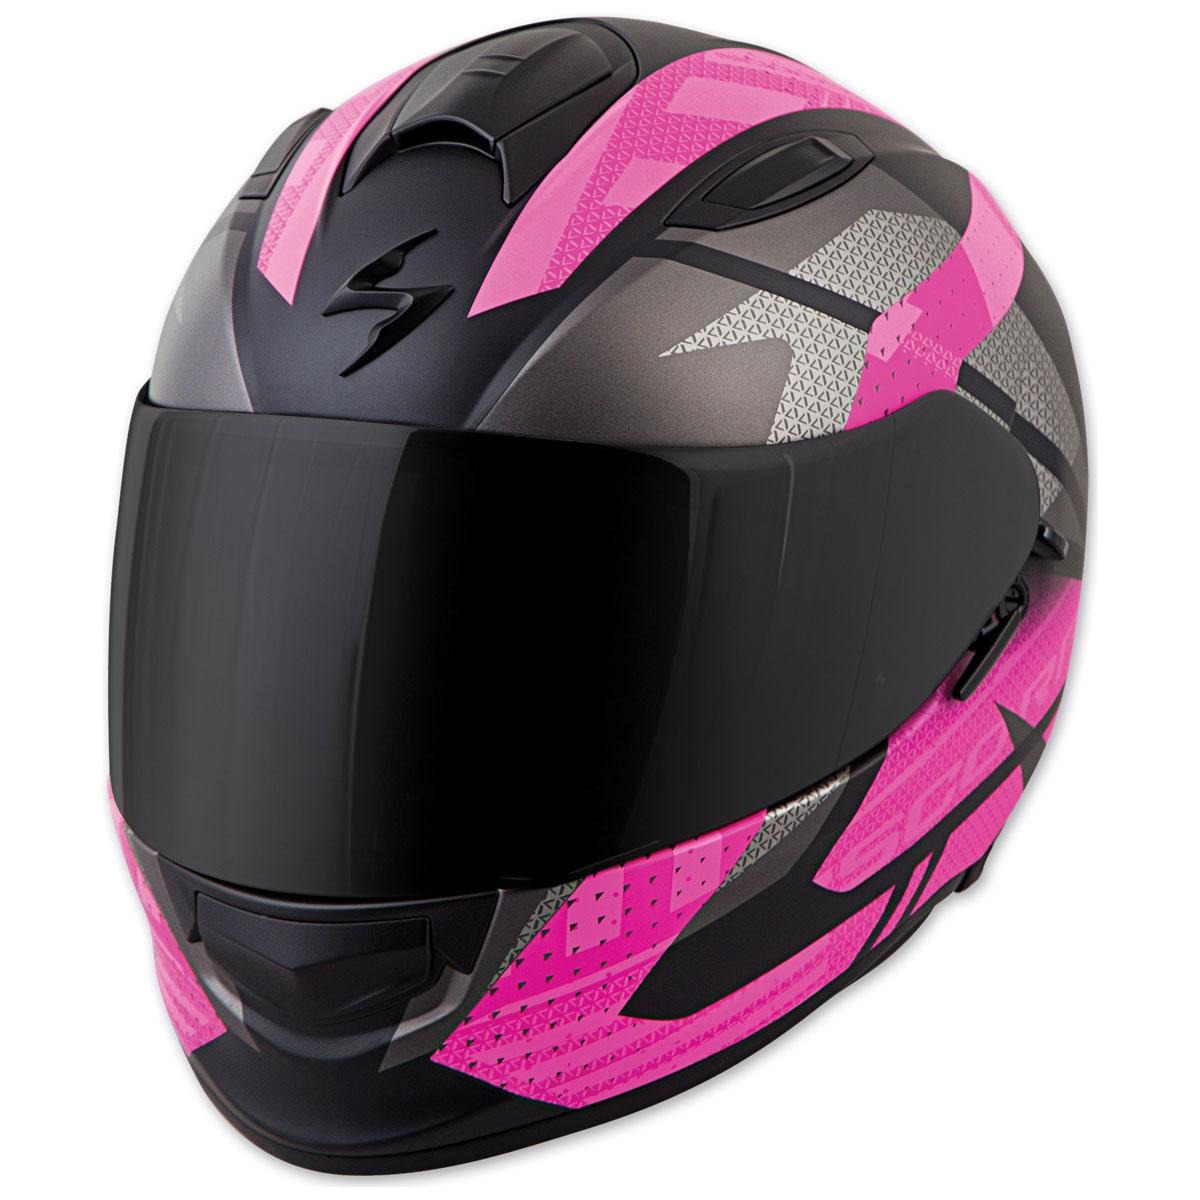 Scorpion EXO EXO-T510 Fury Black/Pink Full Face Helmet